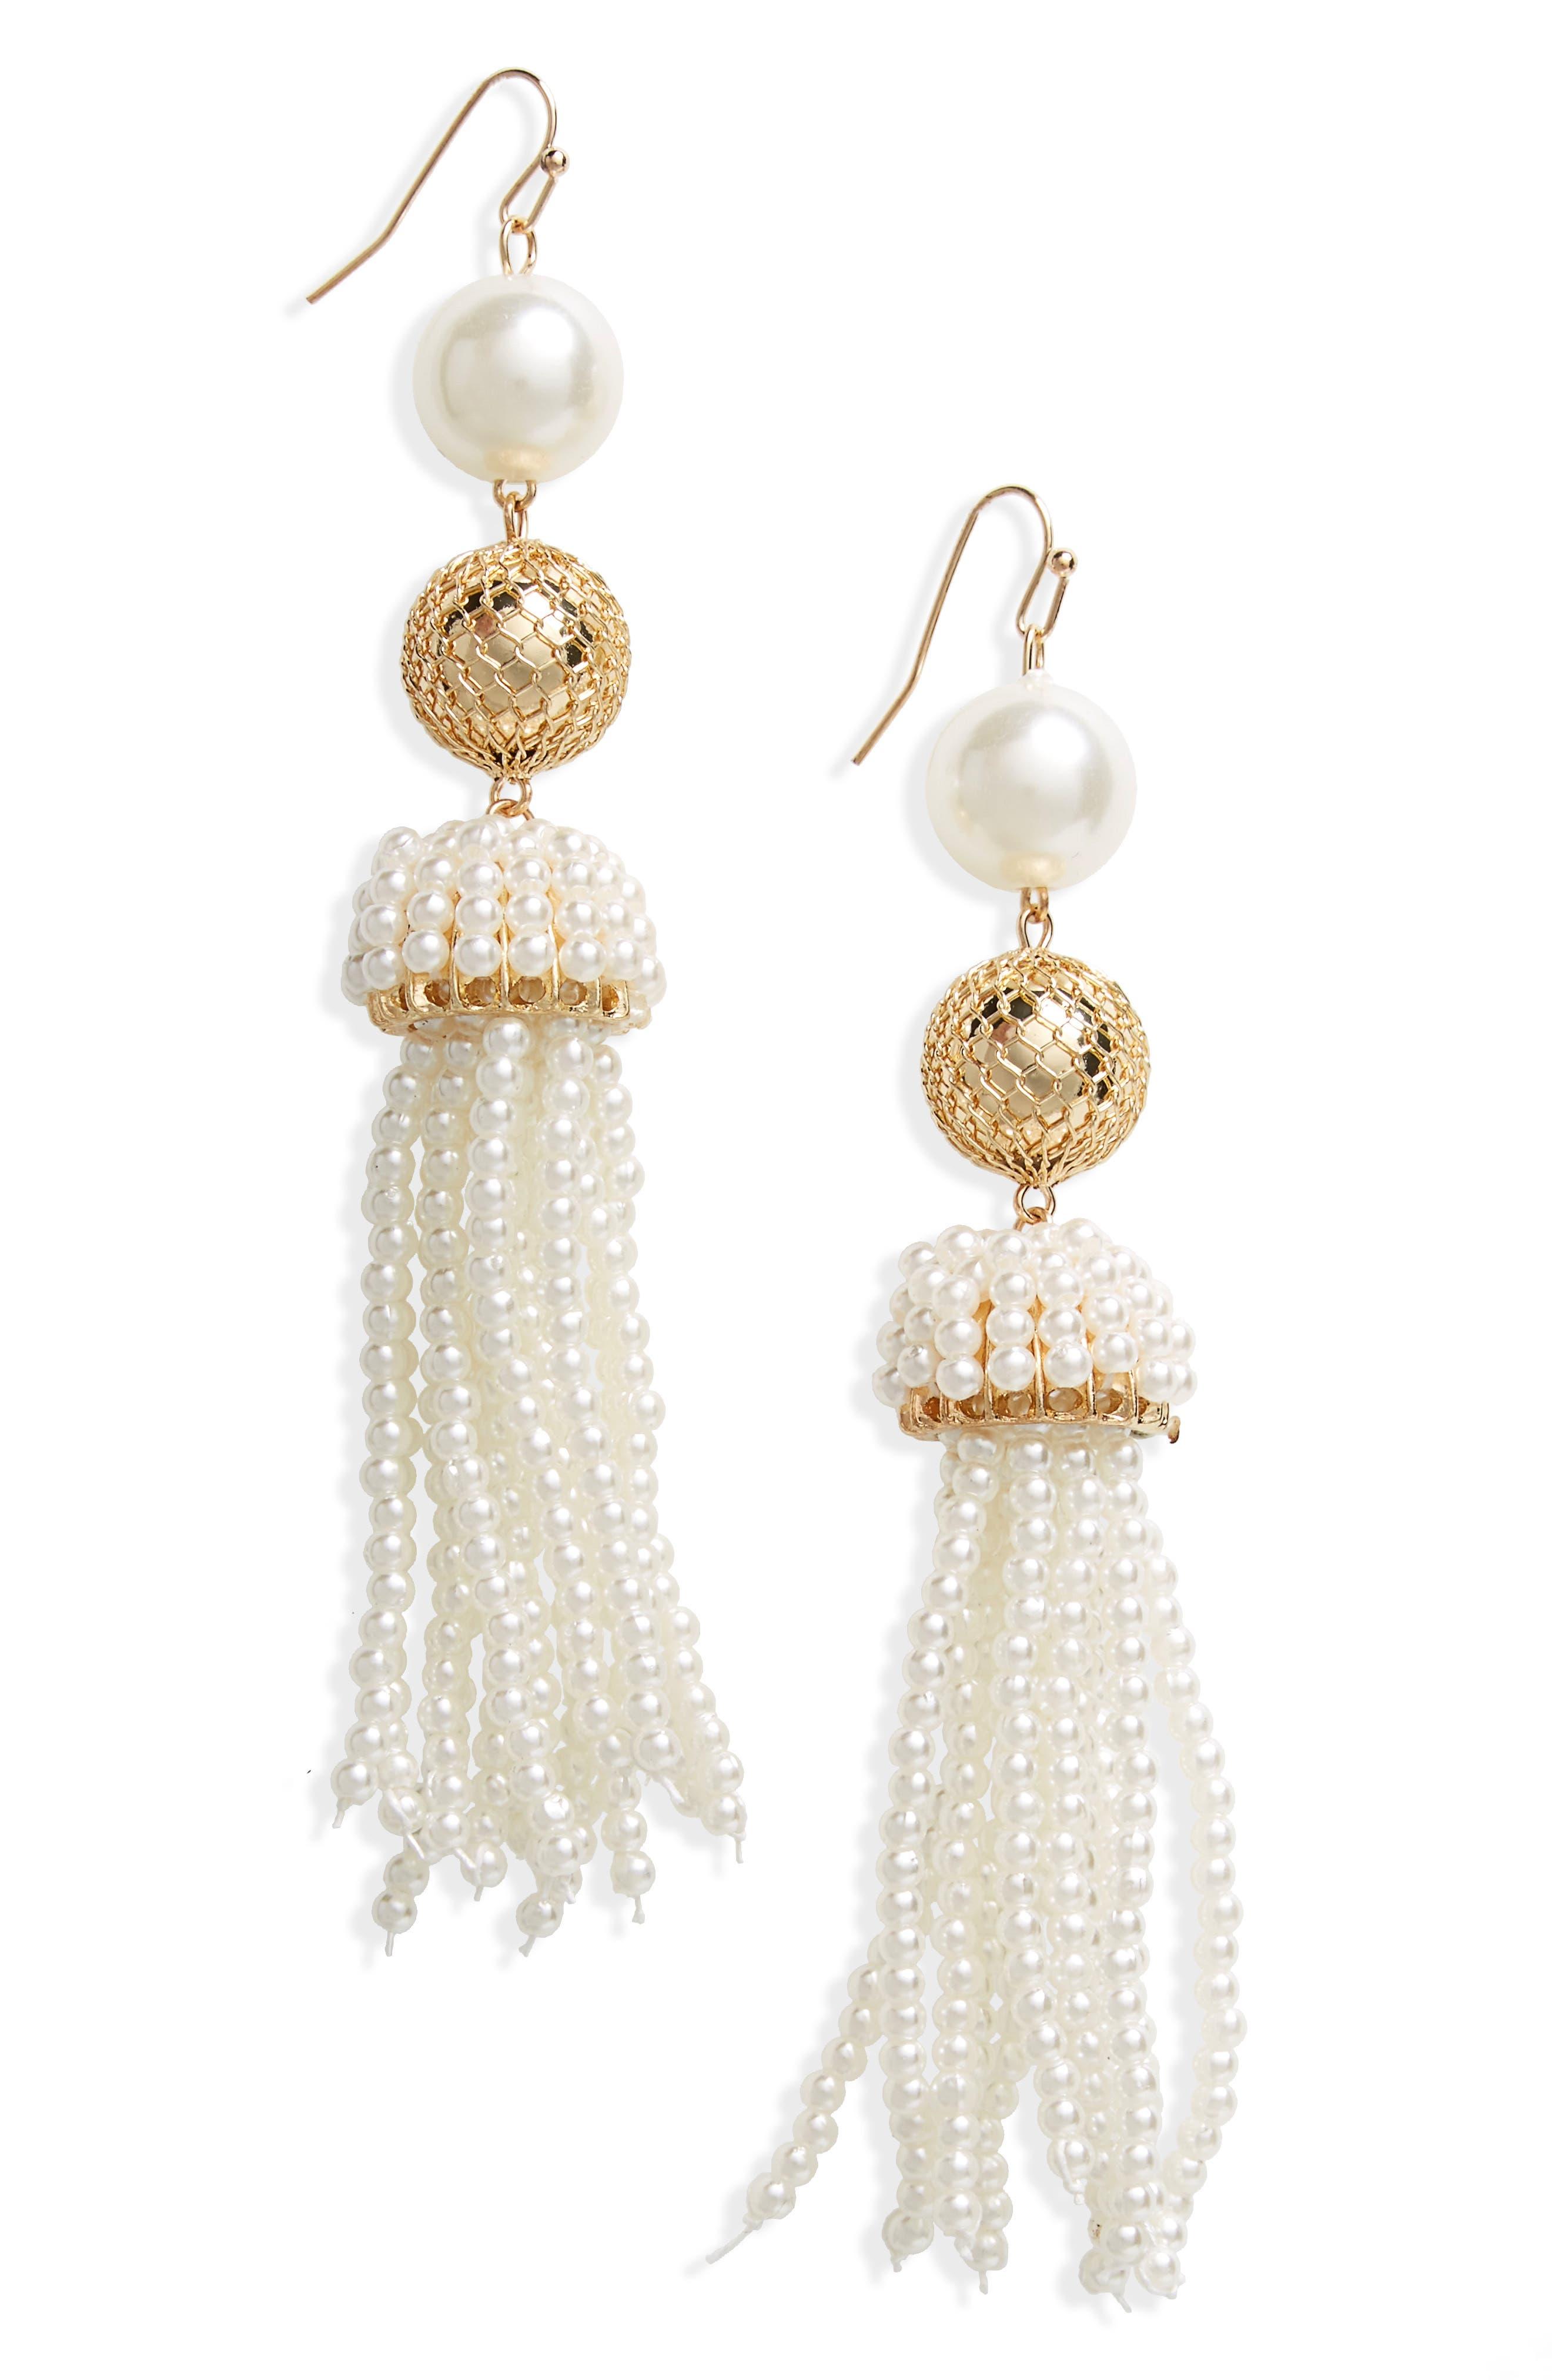 Imitation Pearl Beaded Tassel Earrings,                         Main,                         color, Gold/ Pearl